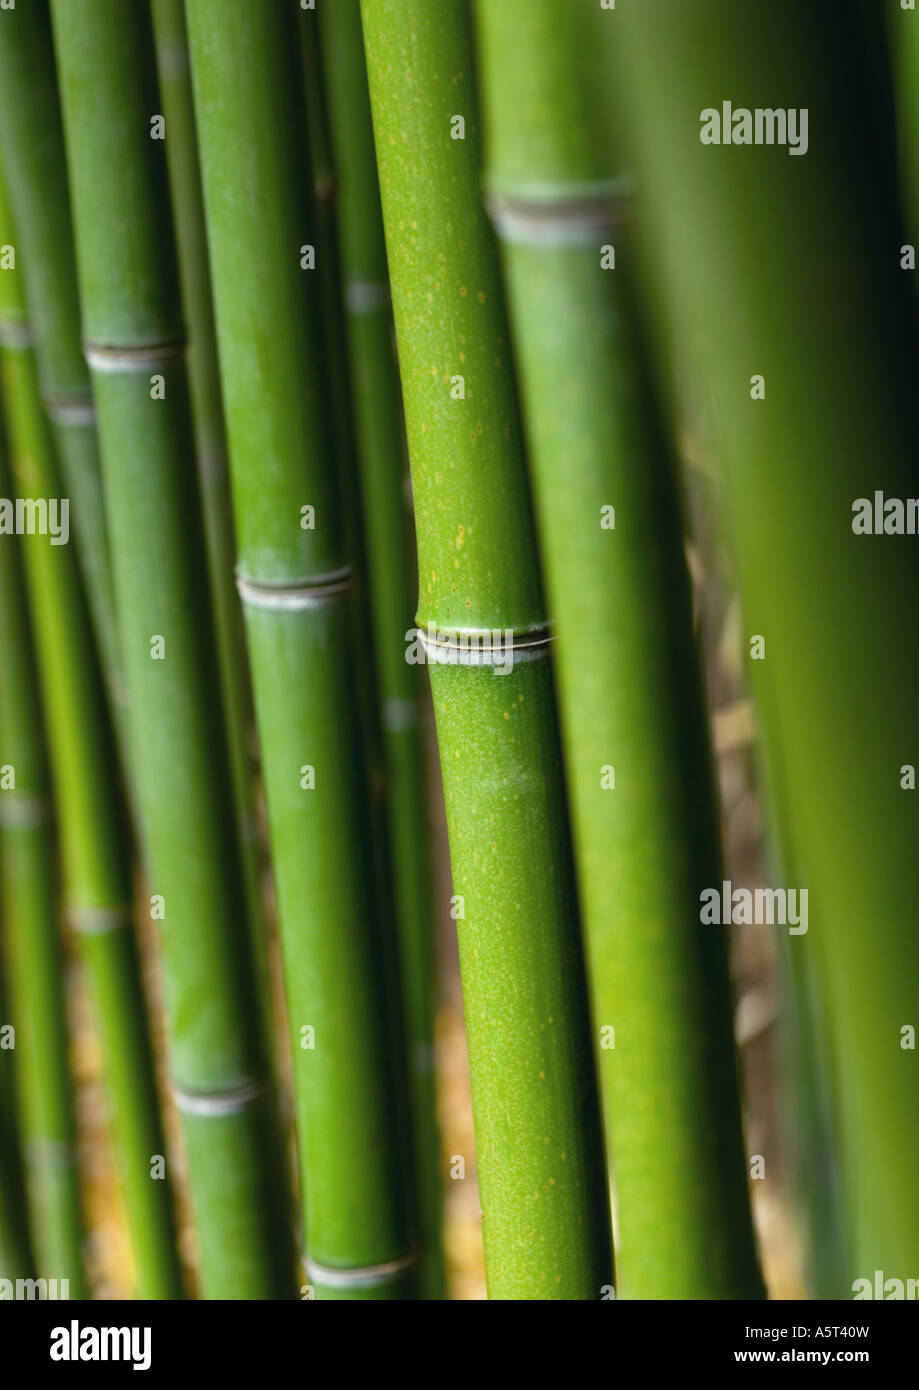 Bamboo stalks - Stock Image